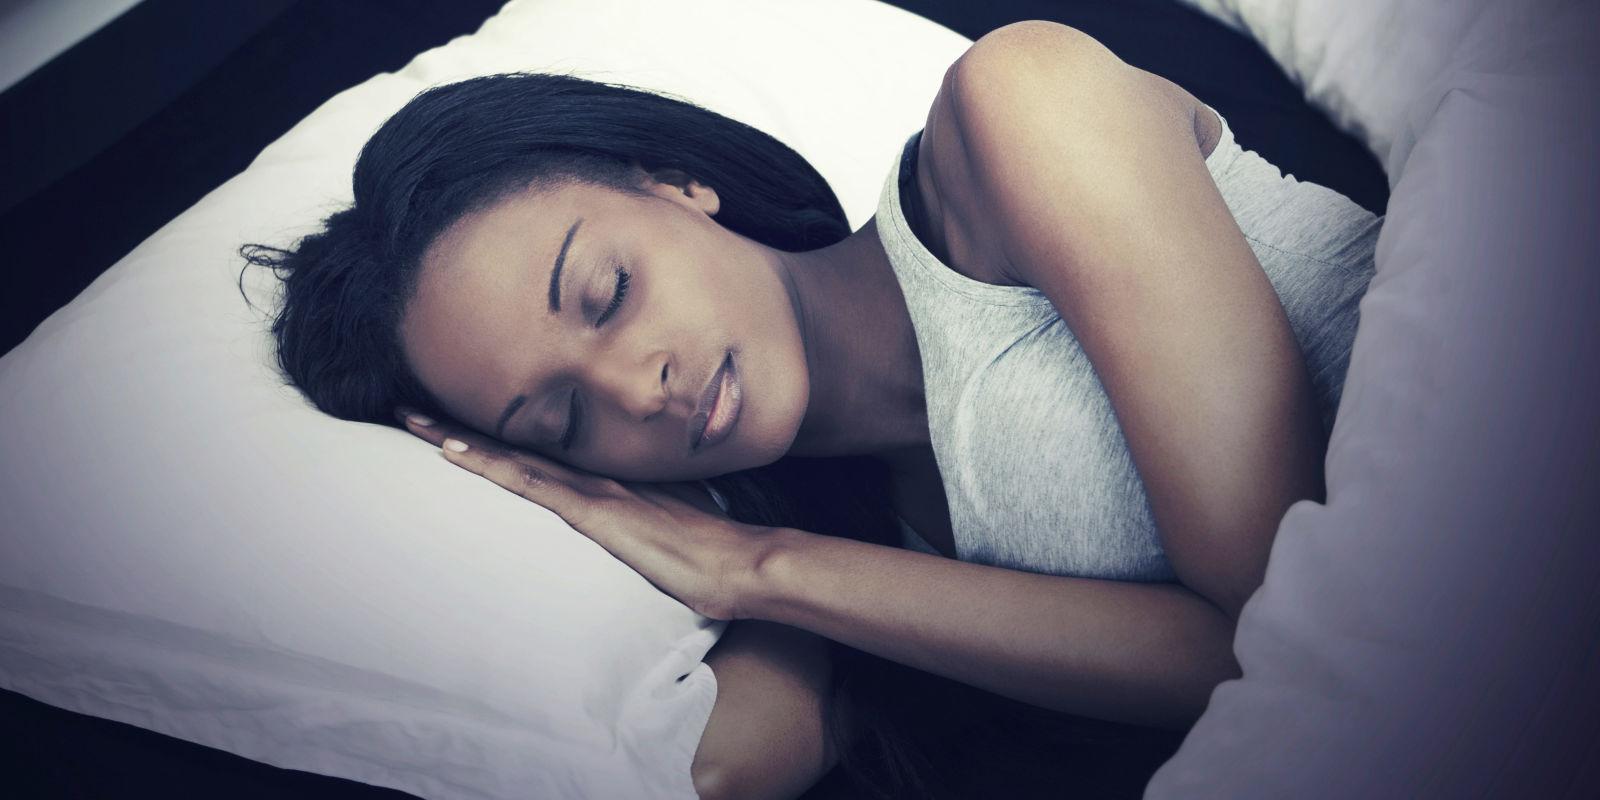 Oversleeping Is Bad For You - Too Much Sleep Study